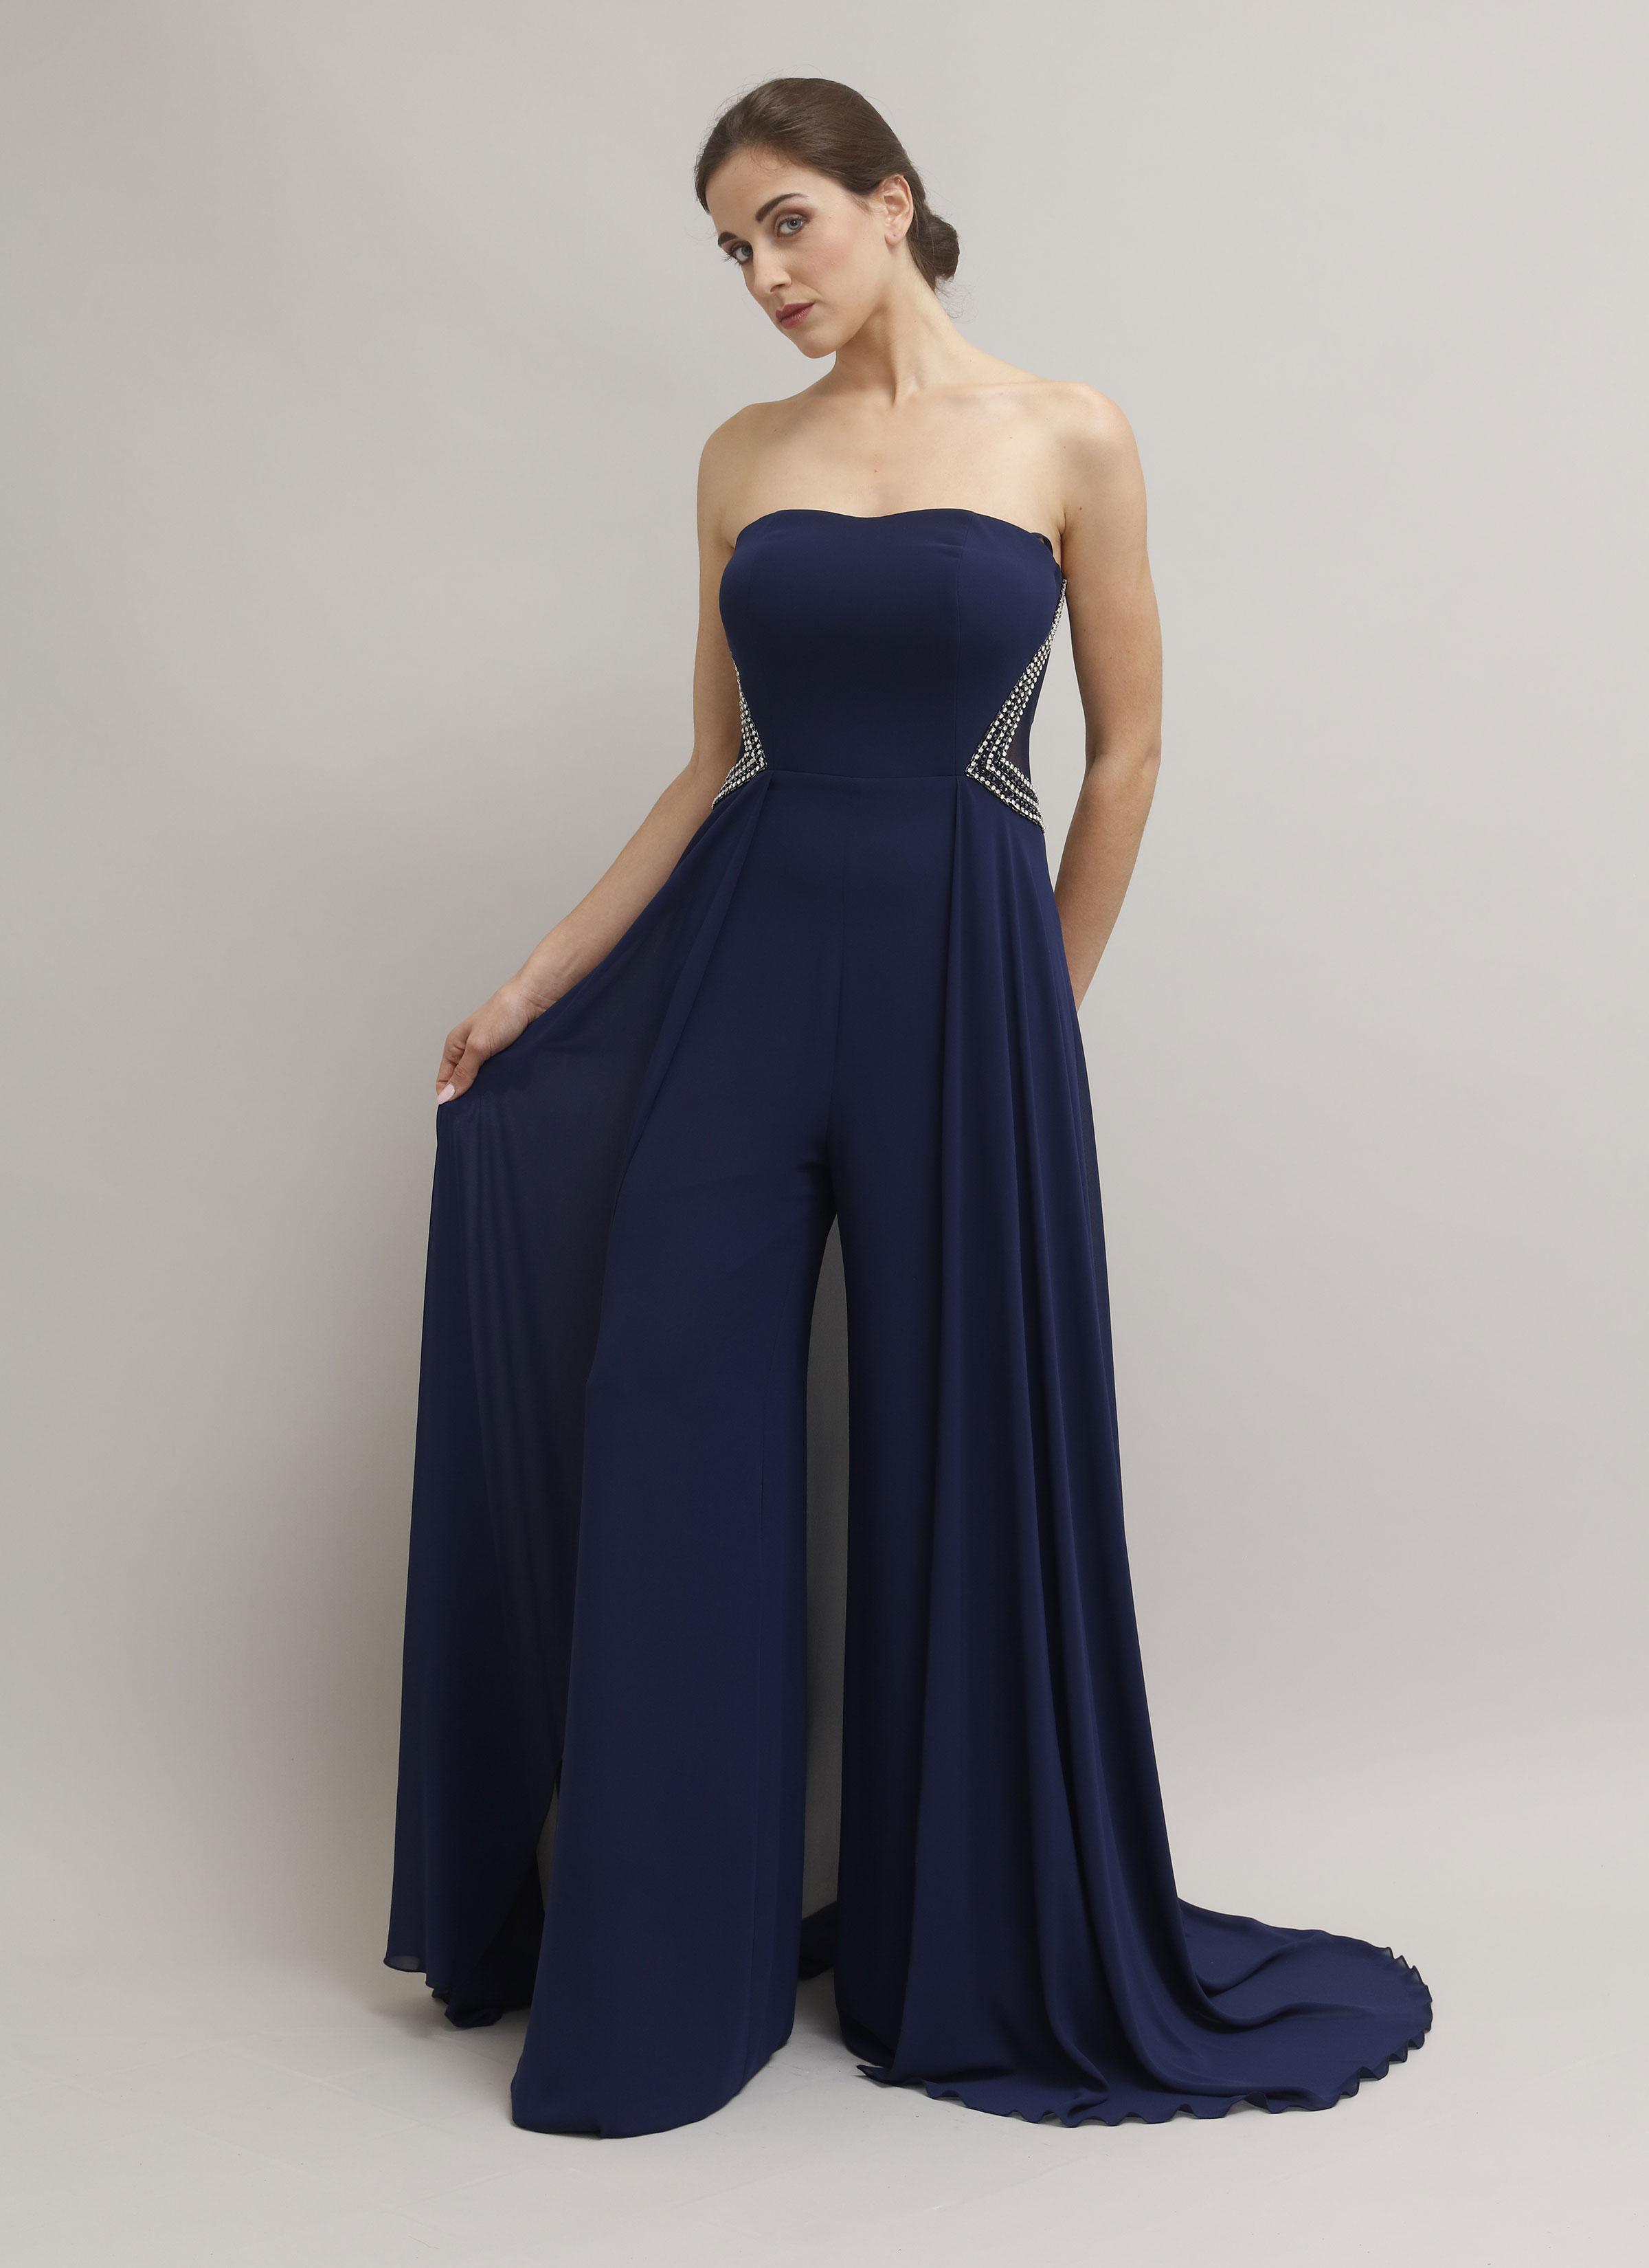 best sneakers 4c759 6a4d8 Liliana | Tuta intera elegante blu - Mariella Gennarino Alta Moda